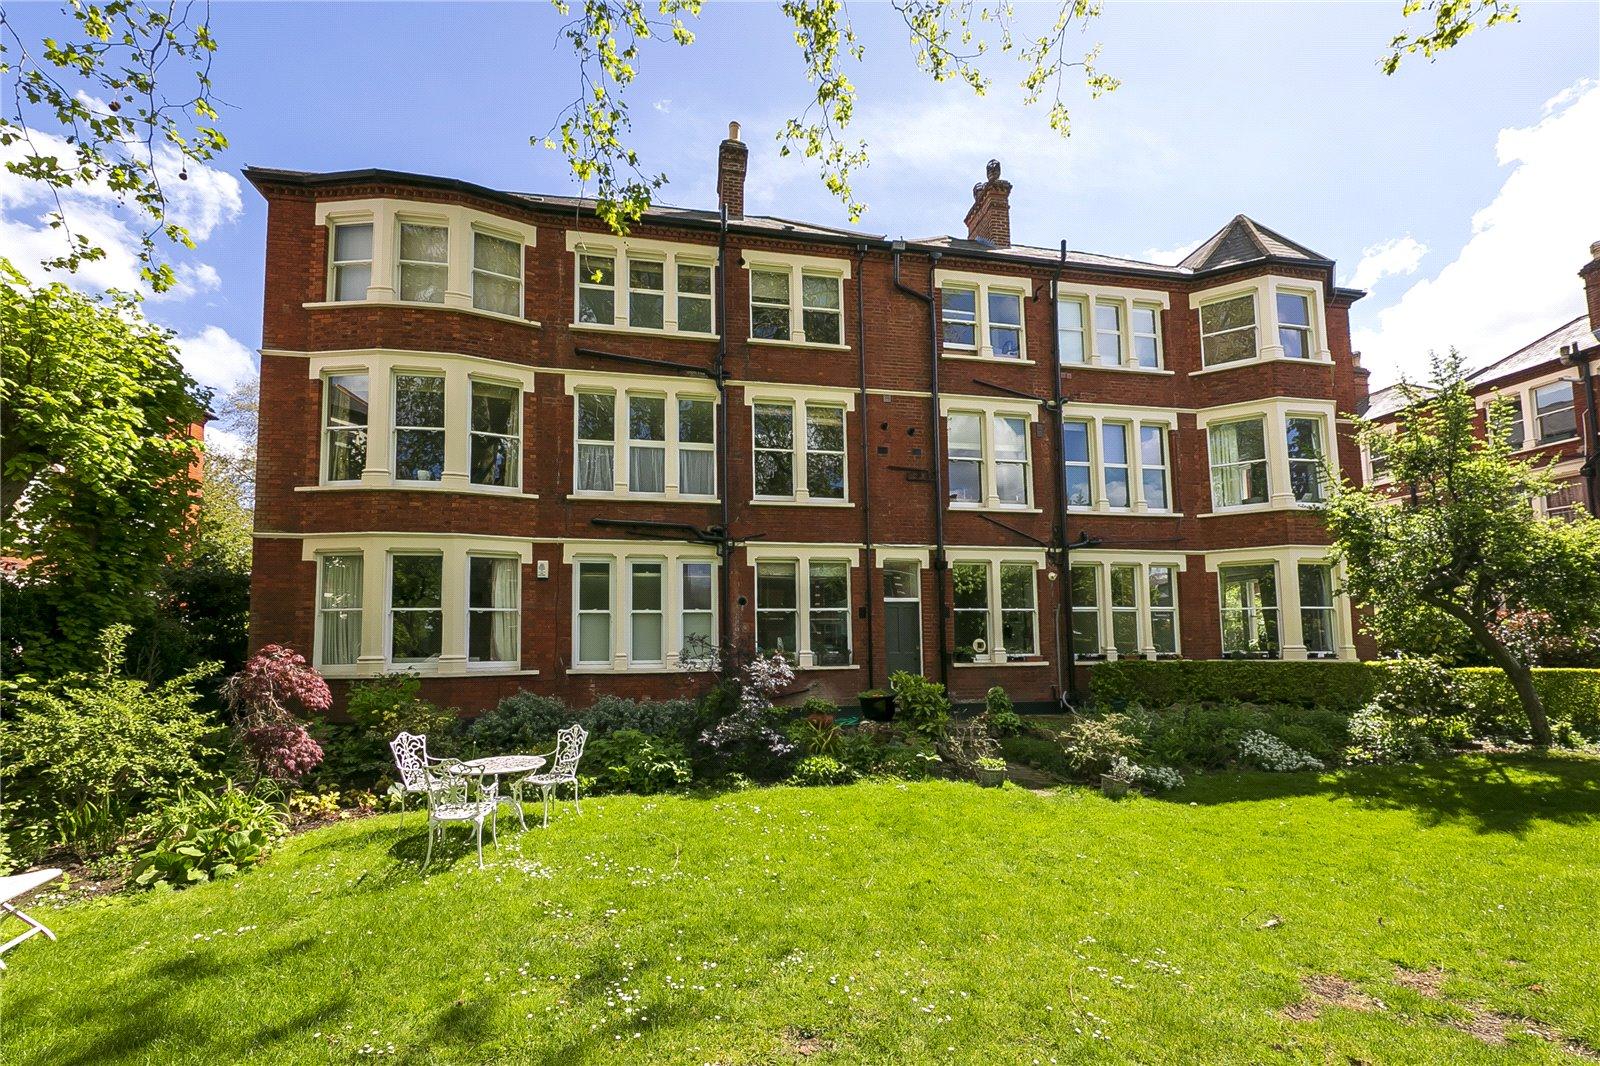 Balmoral Mansions, Clevedon Road, TW1 2HZ - Antony Roberts